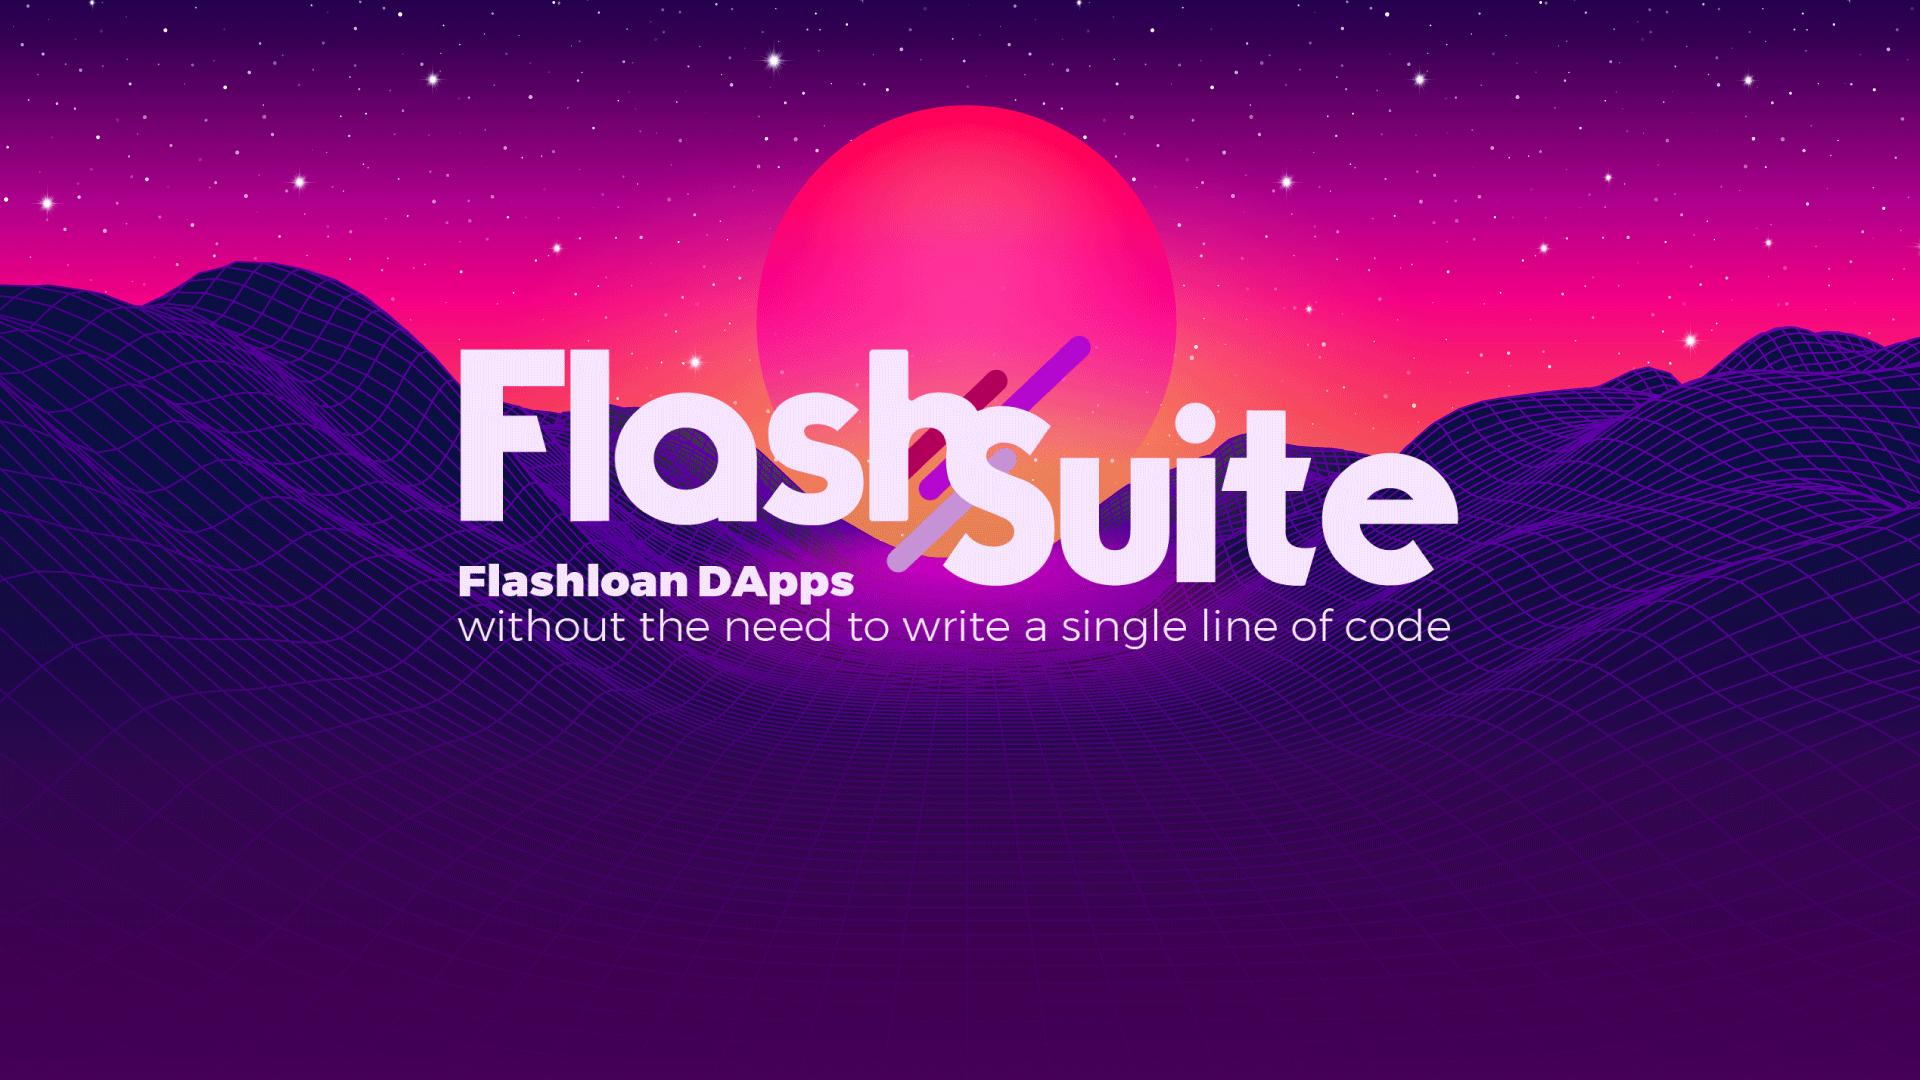 FlashSuite showcase